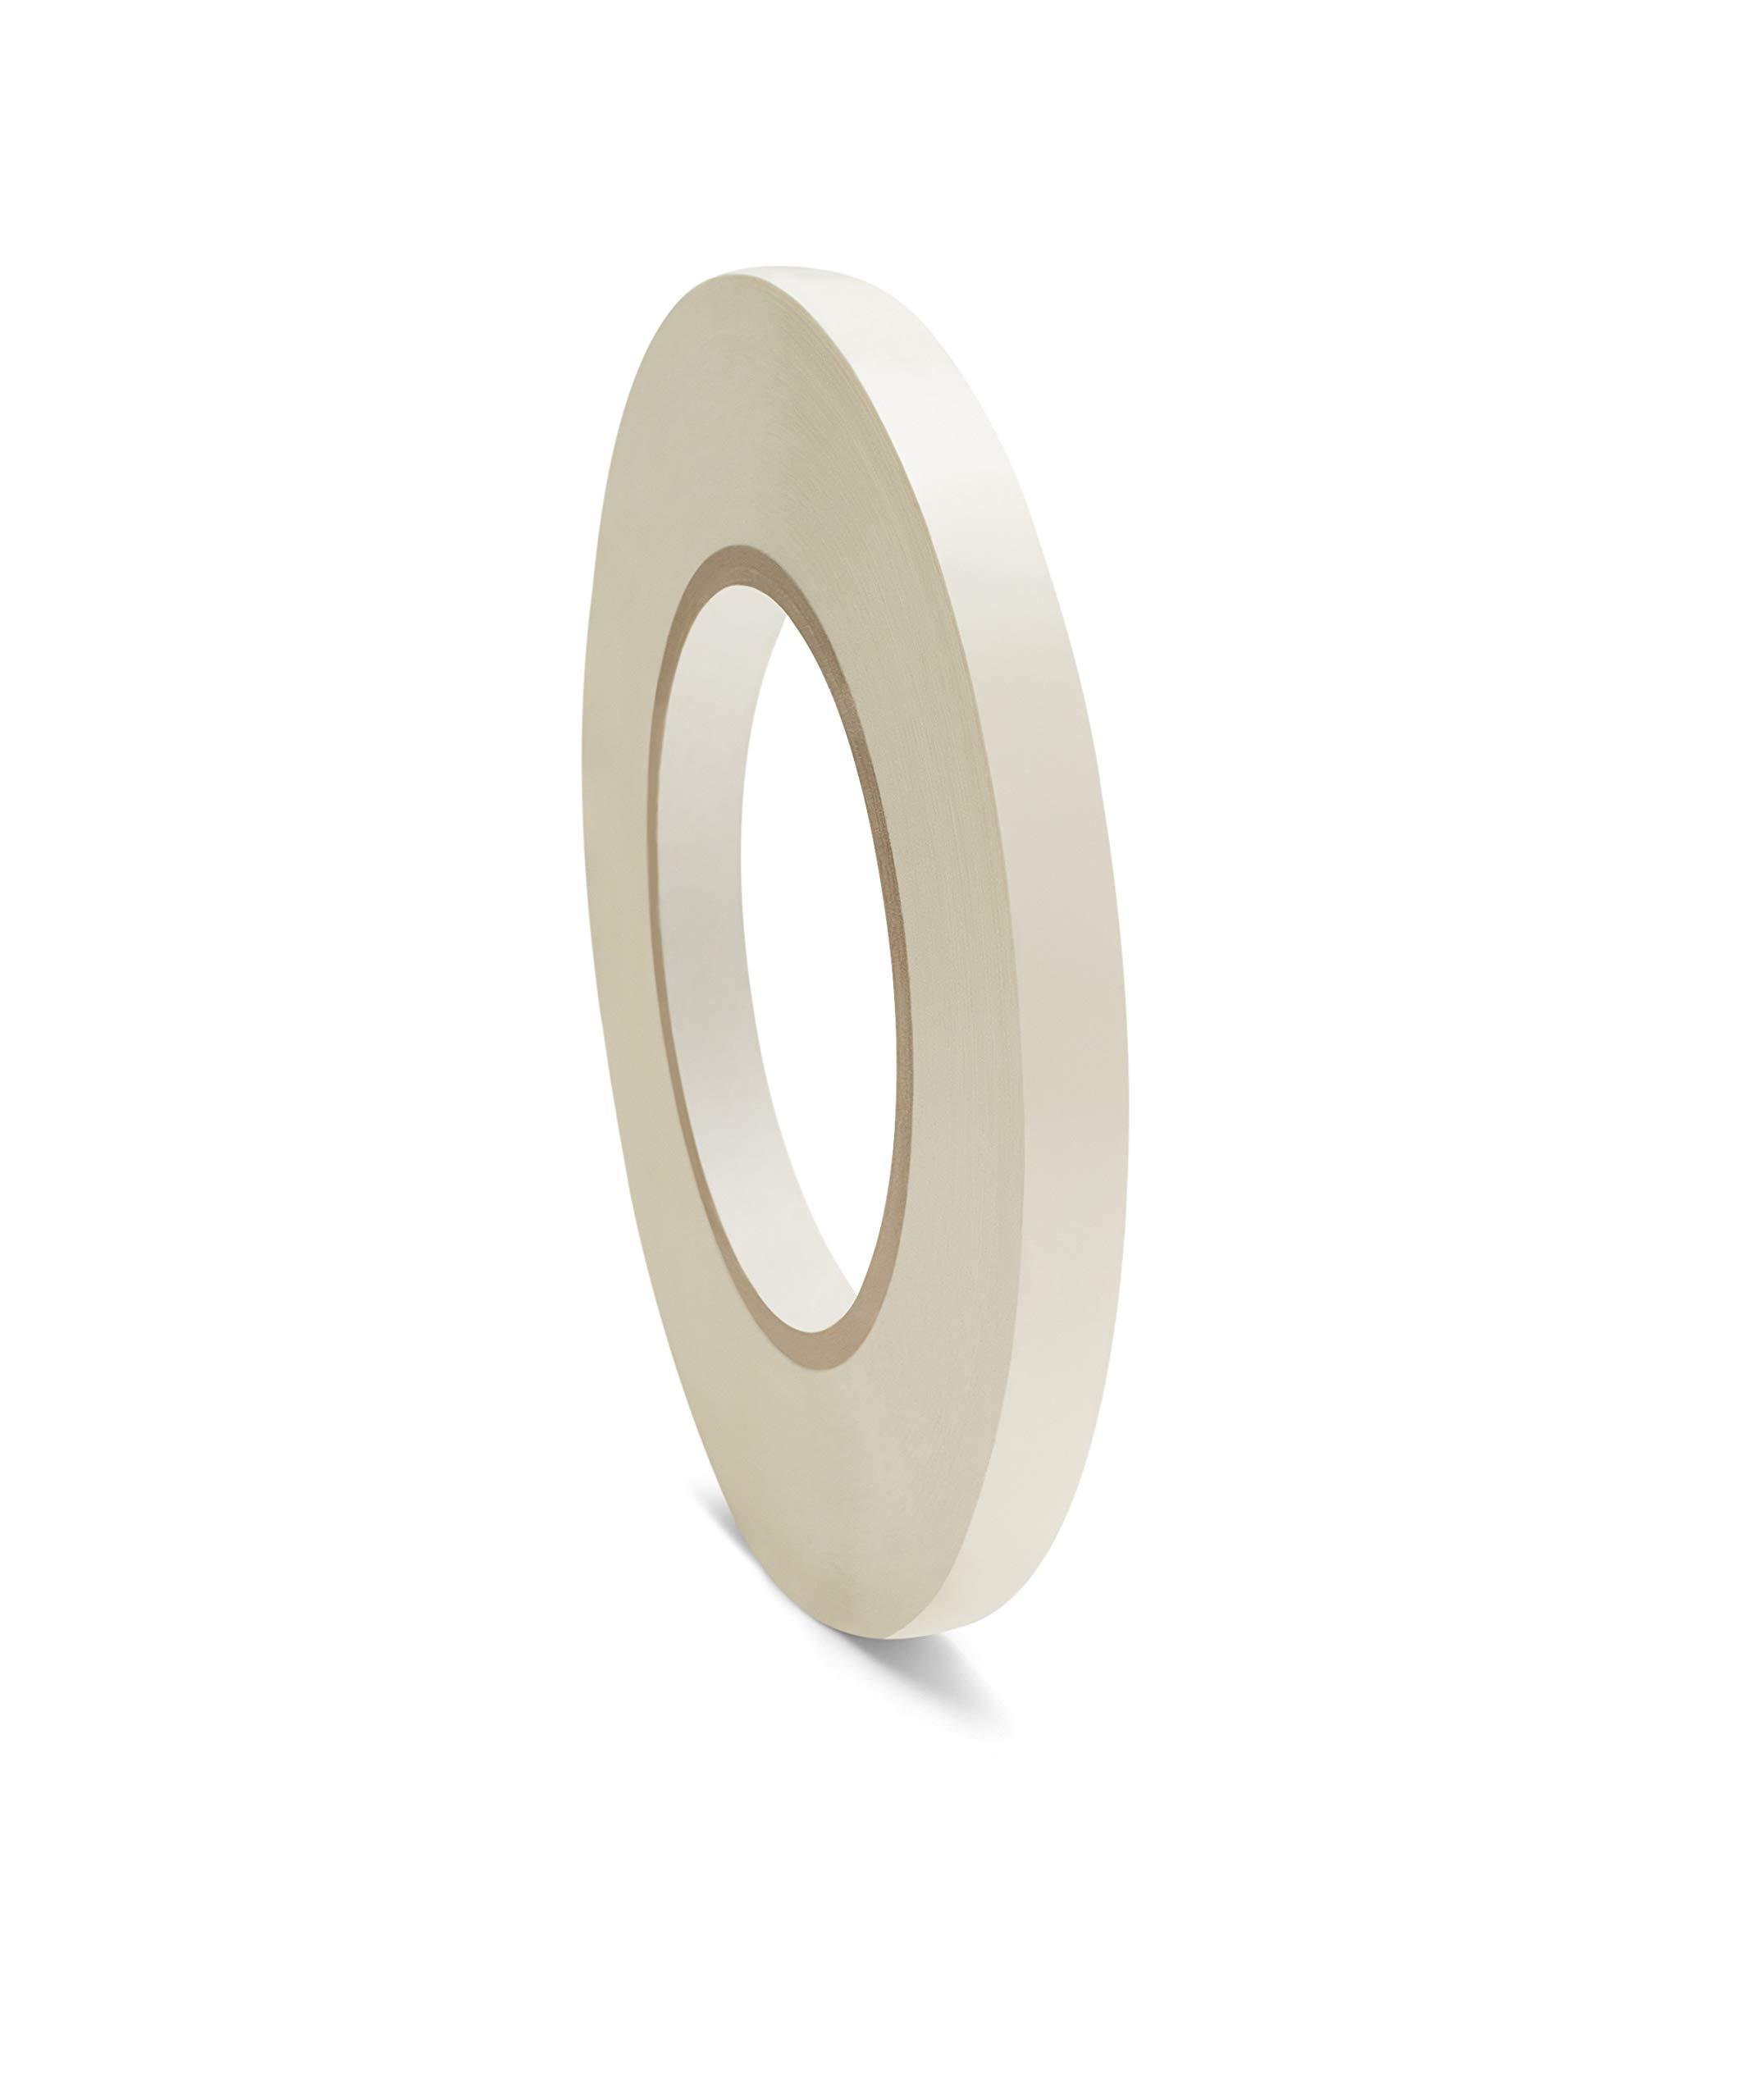 White Poly Bag Sealer Tape 3/8 Inch x 180 Yards 6 Rolls